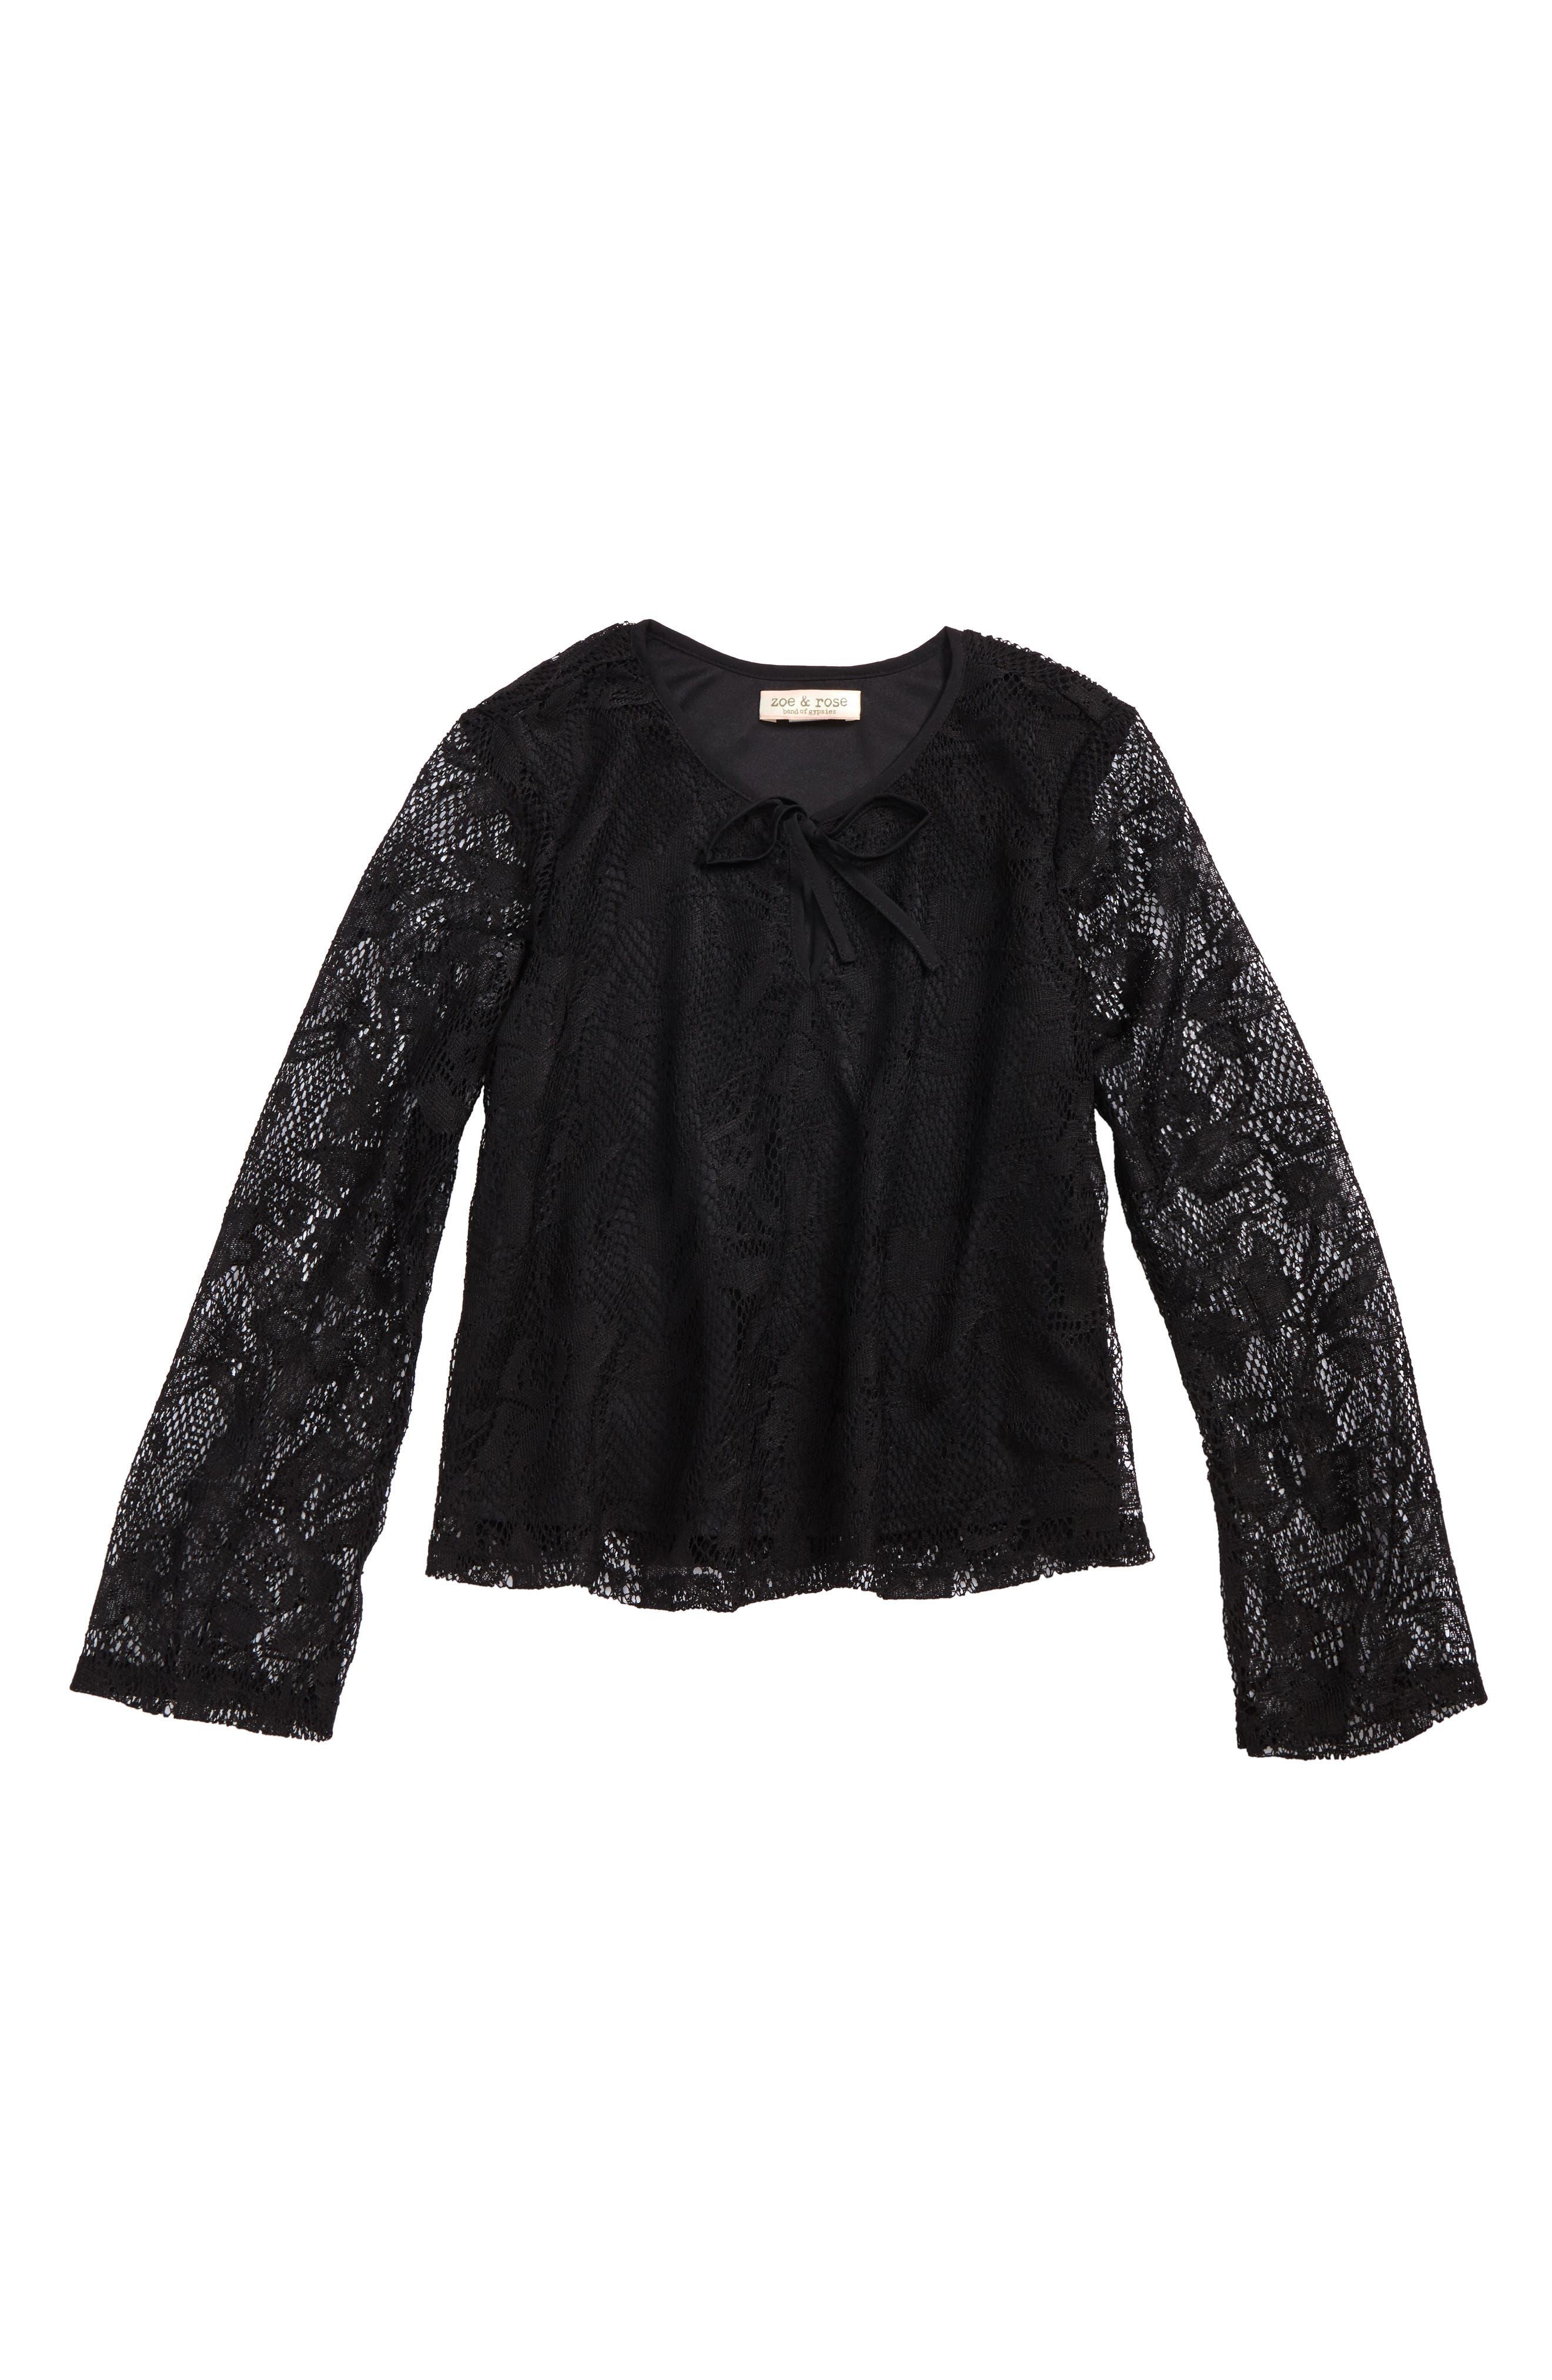 Zoe & Rose Lace Flare Sleeve Blouse,                             Main thumbnail 1, color,                             Black